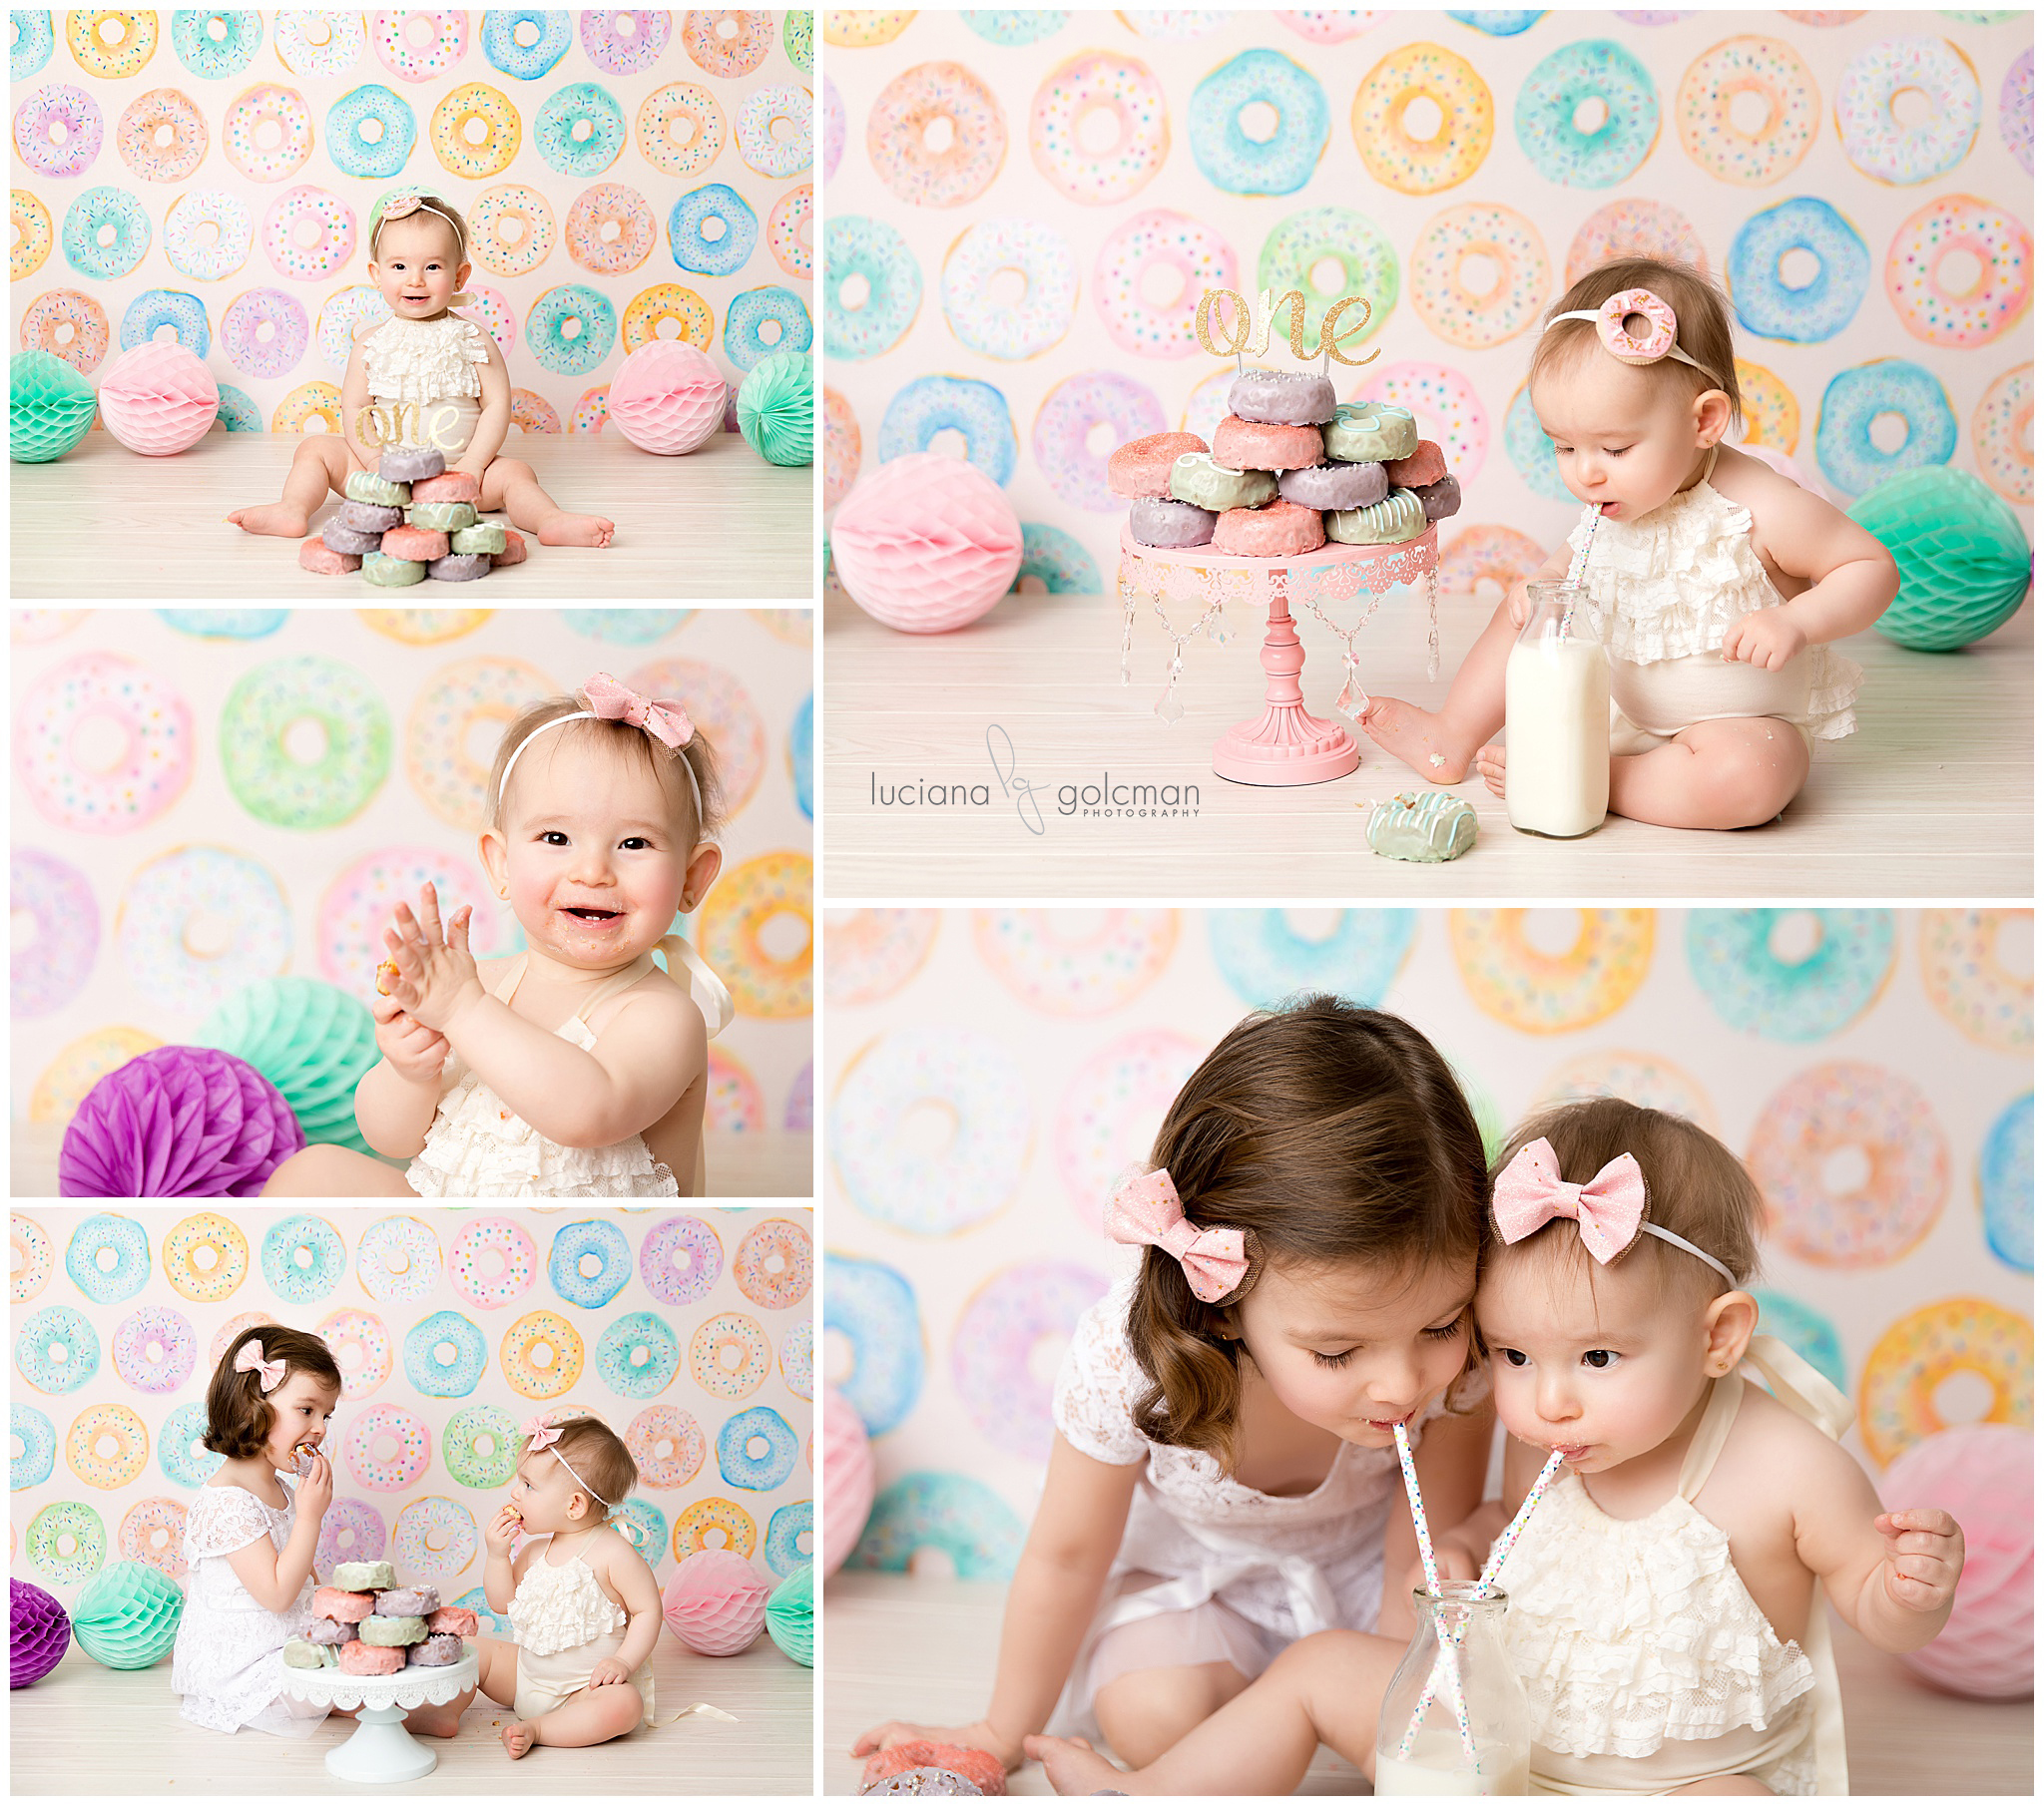 cakesmash+photography+Luciana+Golcman+NYC+38.jpg